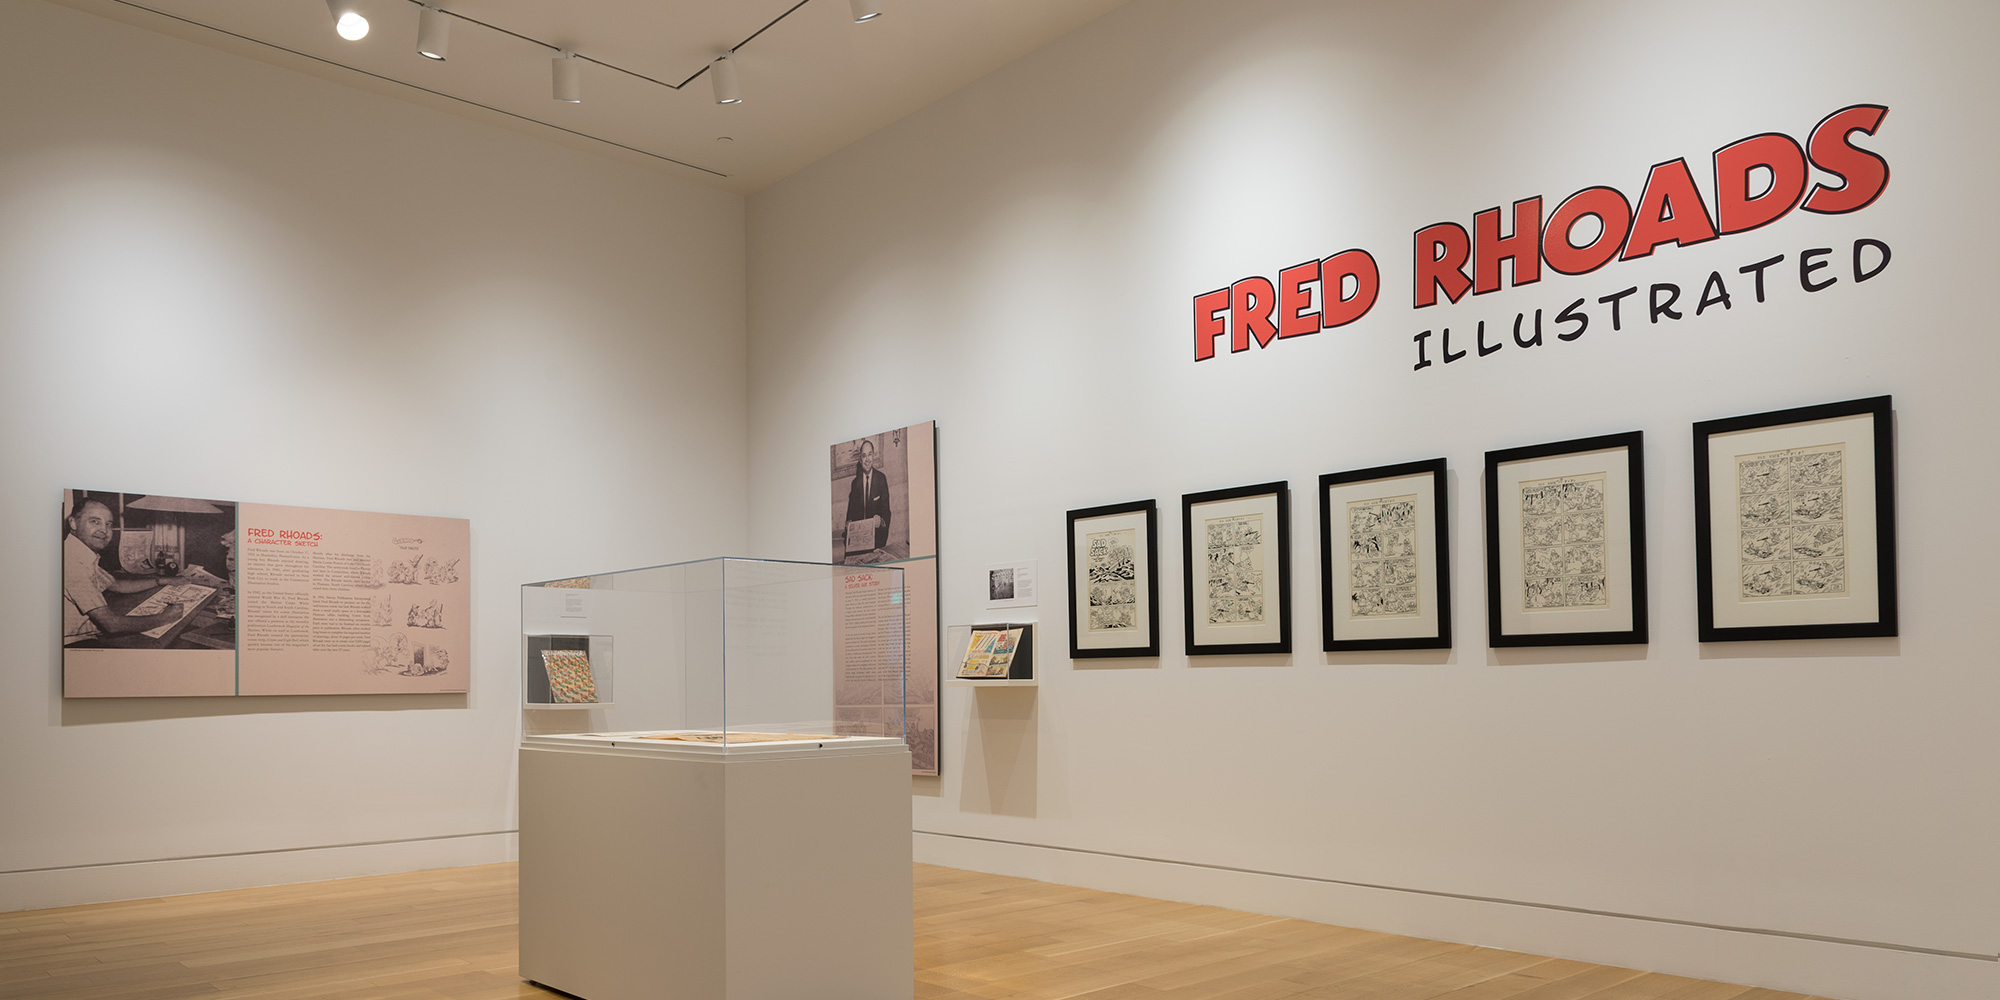 Fred Rhoads Illustrated